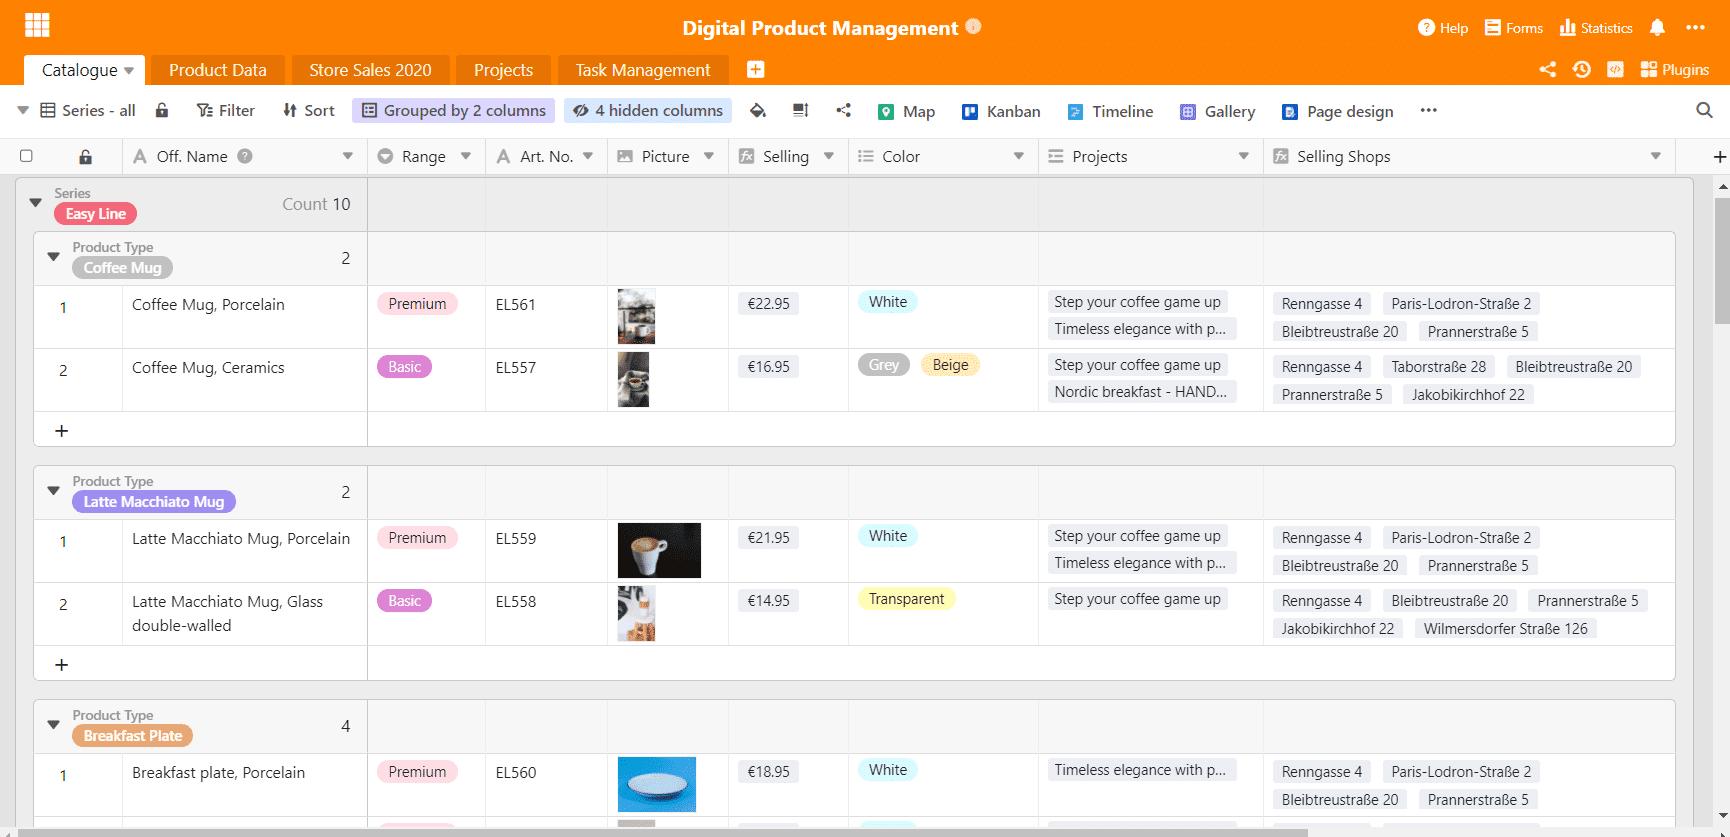 Produktkatalog für digitales Produktmanagement